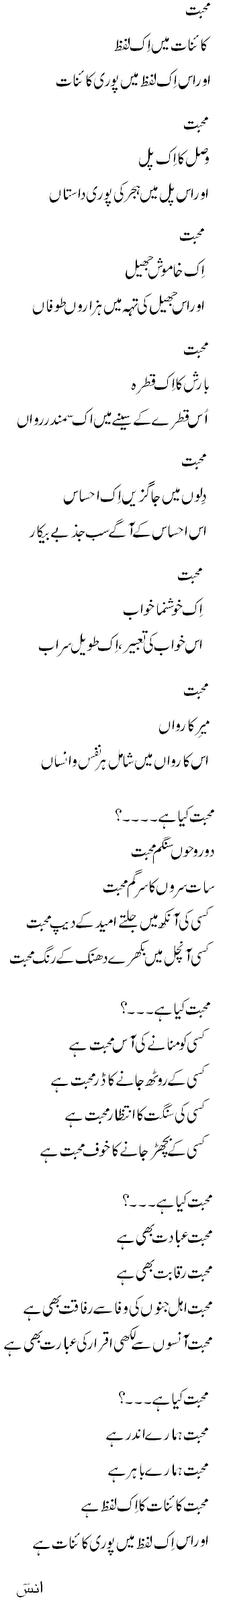 muhabbat (an urdu poem)